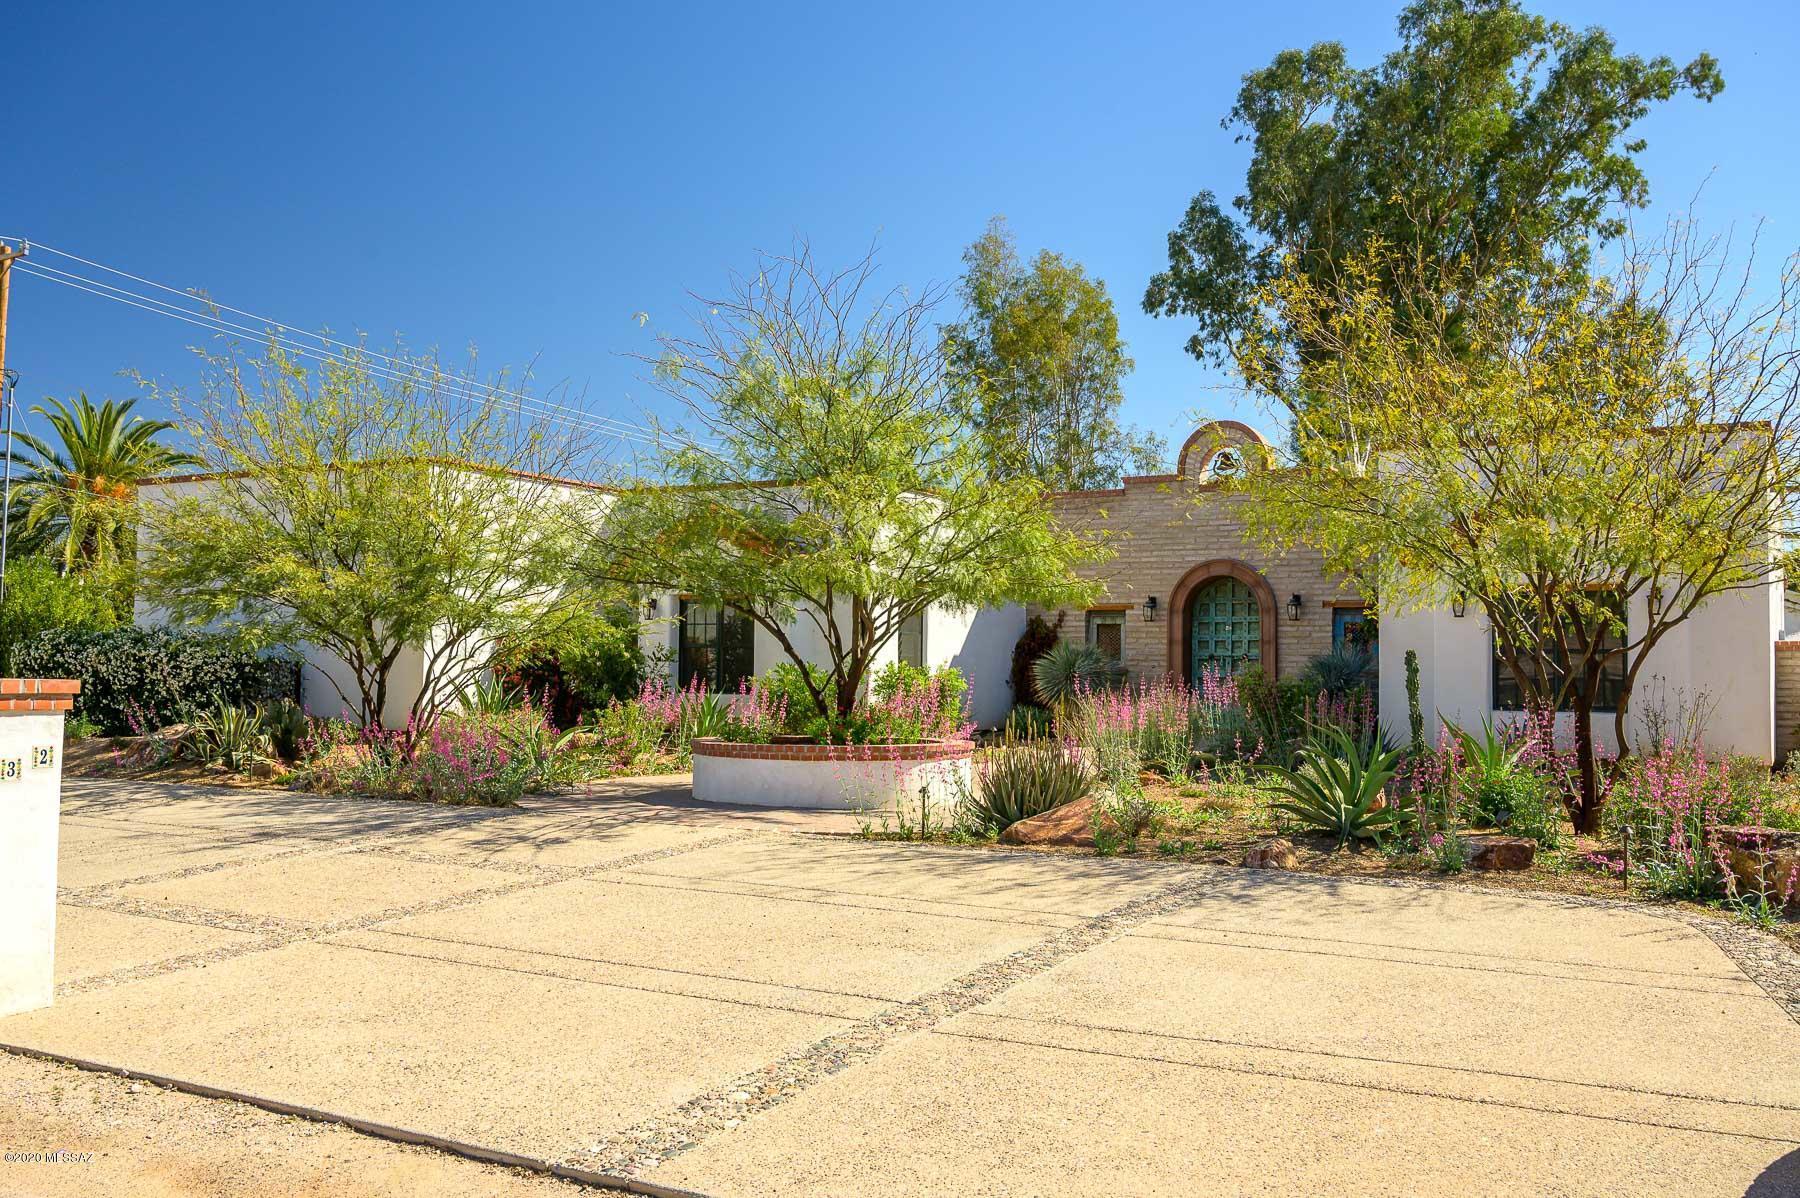 Photo of 132 N Camino Espanol, Tucson, AZ 85716